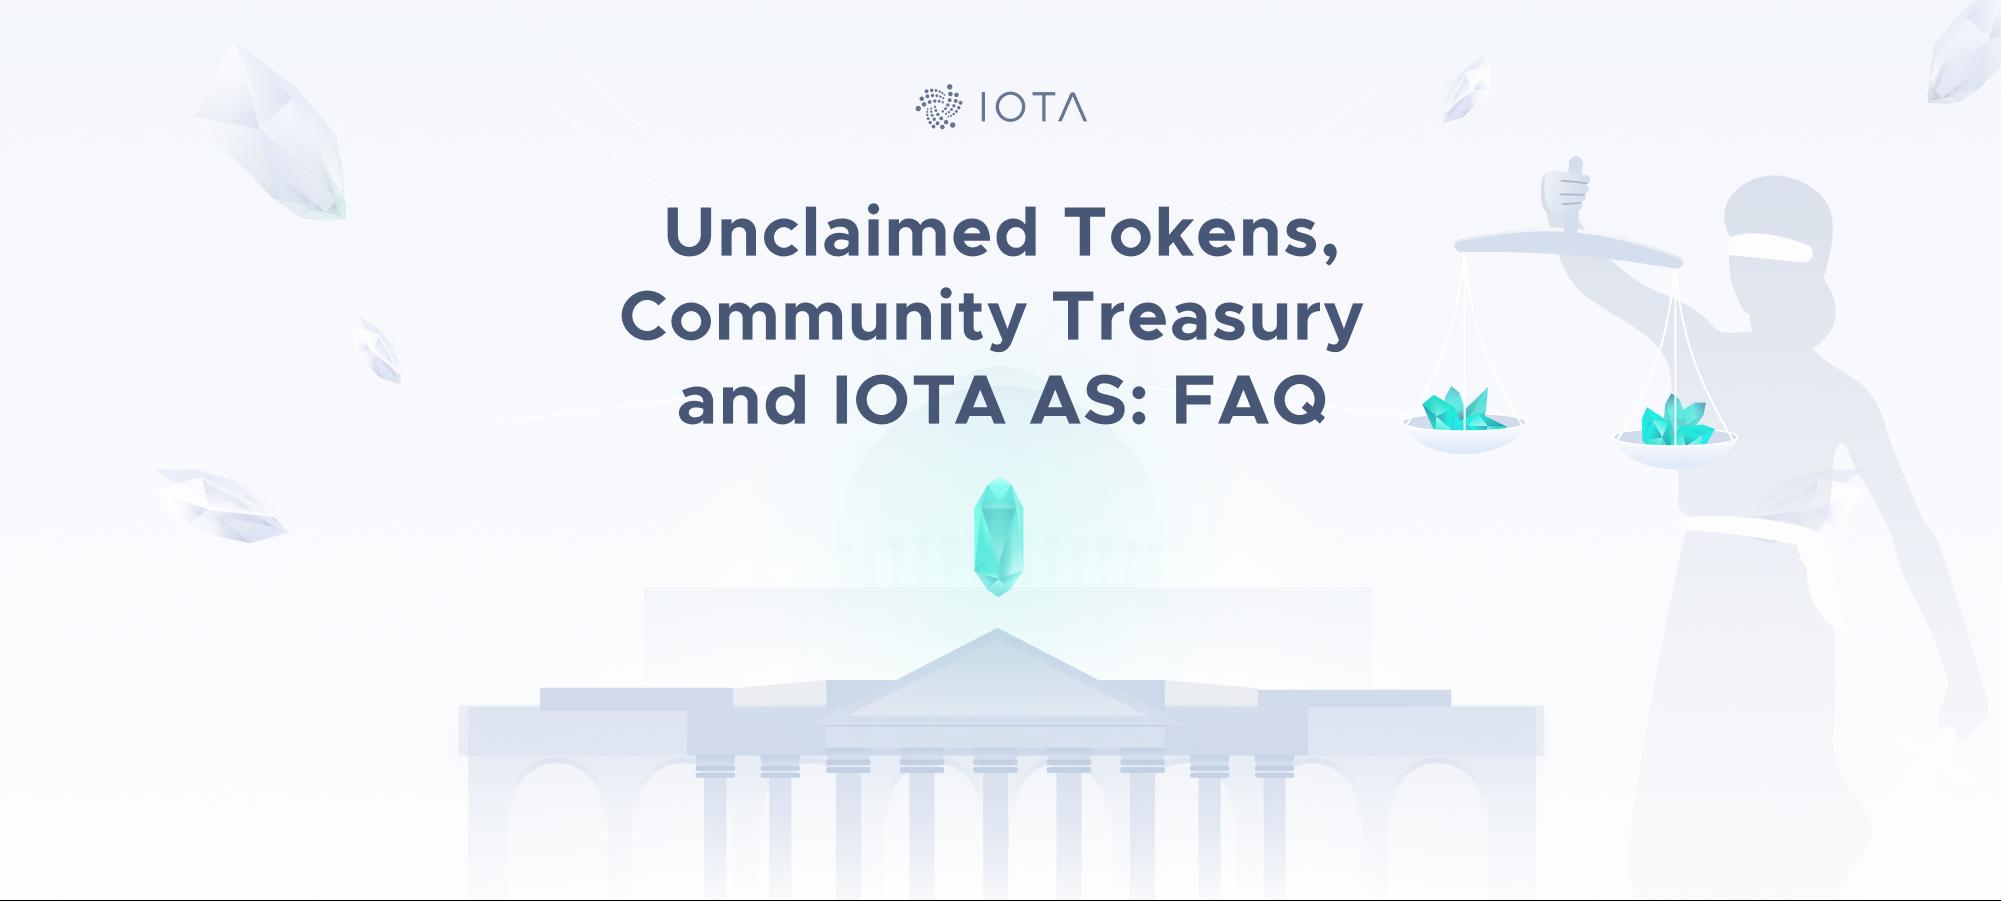 Unclaimed Tokens, Community Treasury and IOTA AS: FAQ